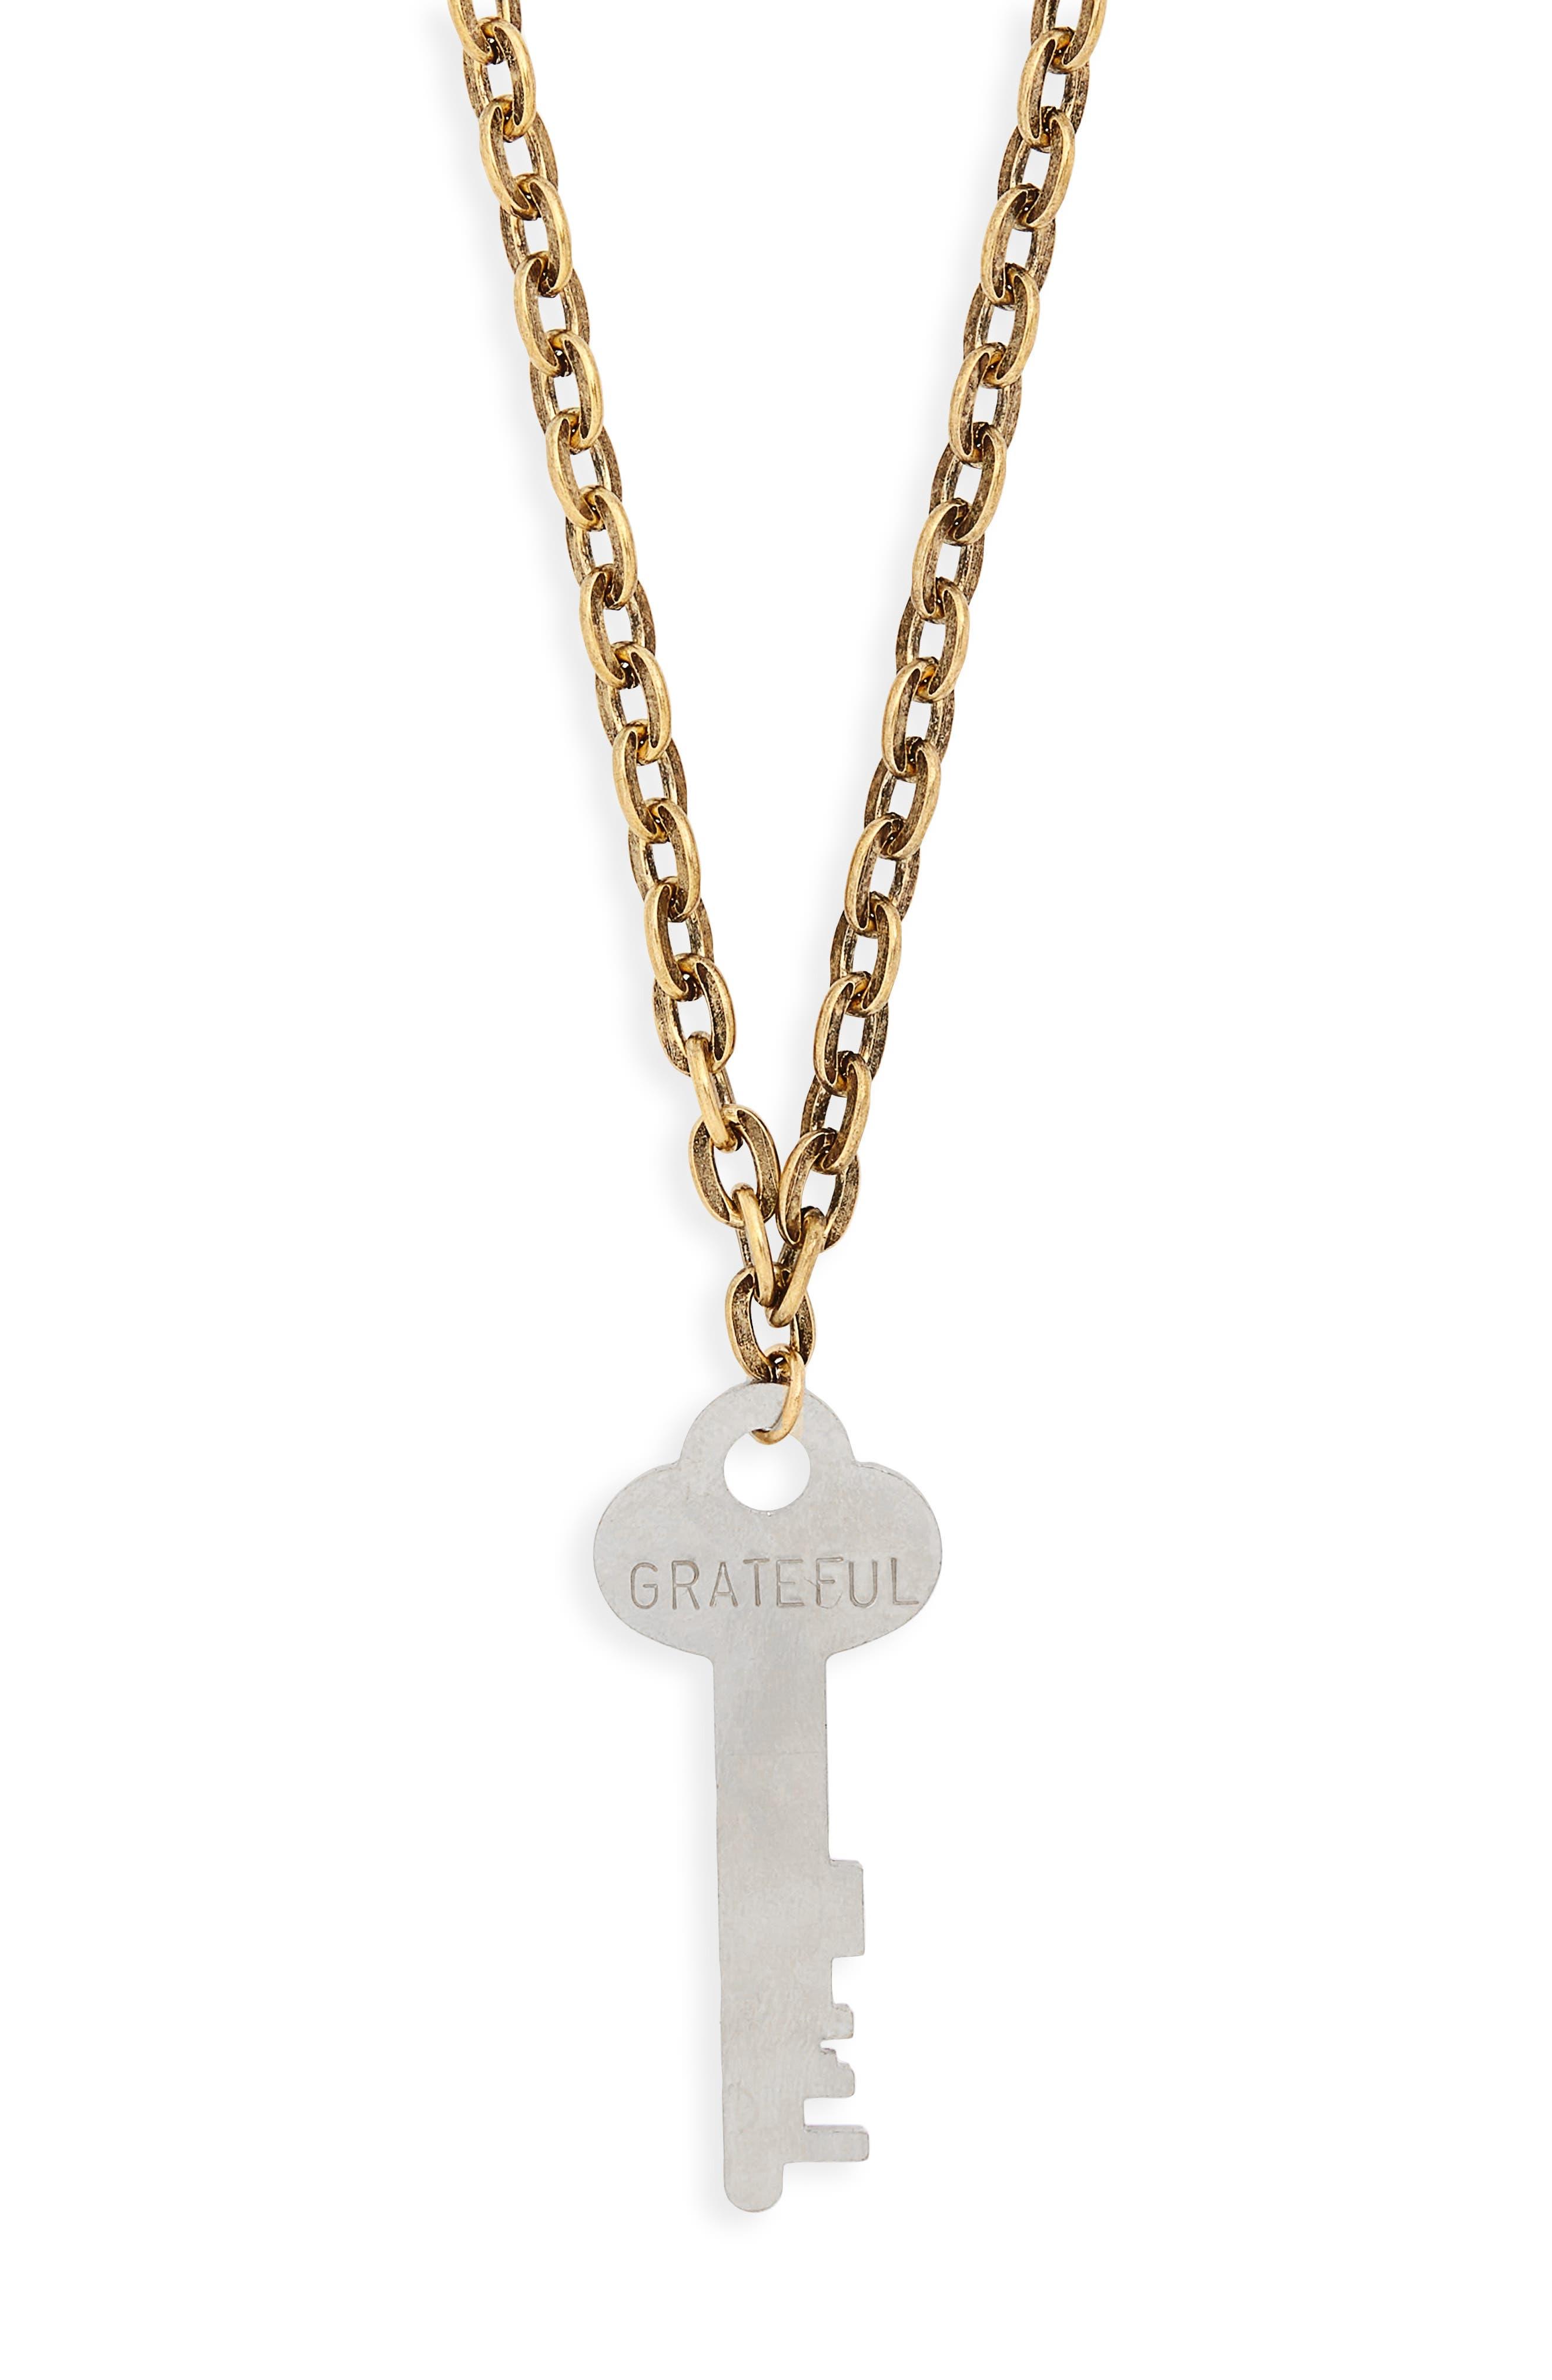 I Am Grateful Key Charm Necklace,                             Alternate thumbnail 3, color,                             GOLD/ SILVER KEY